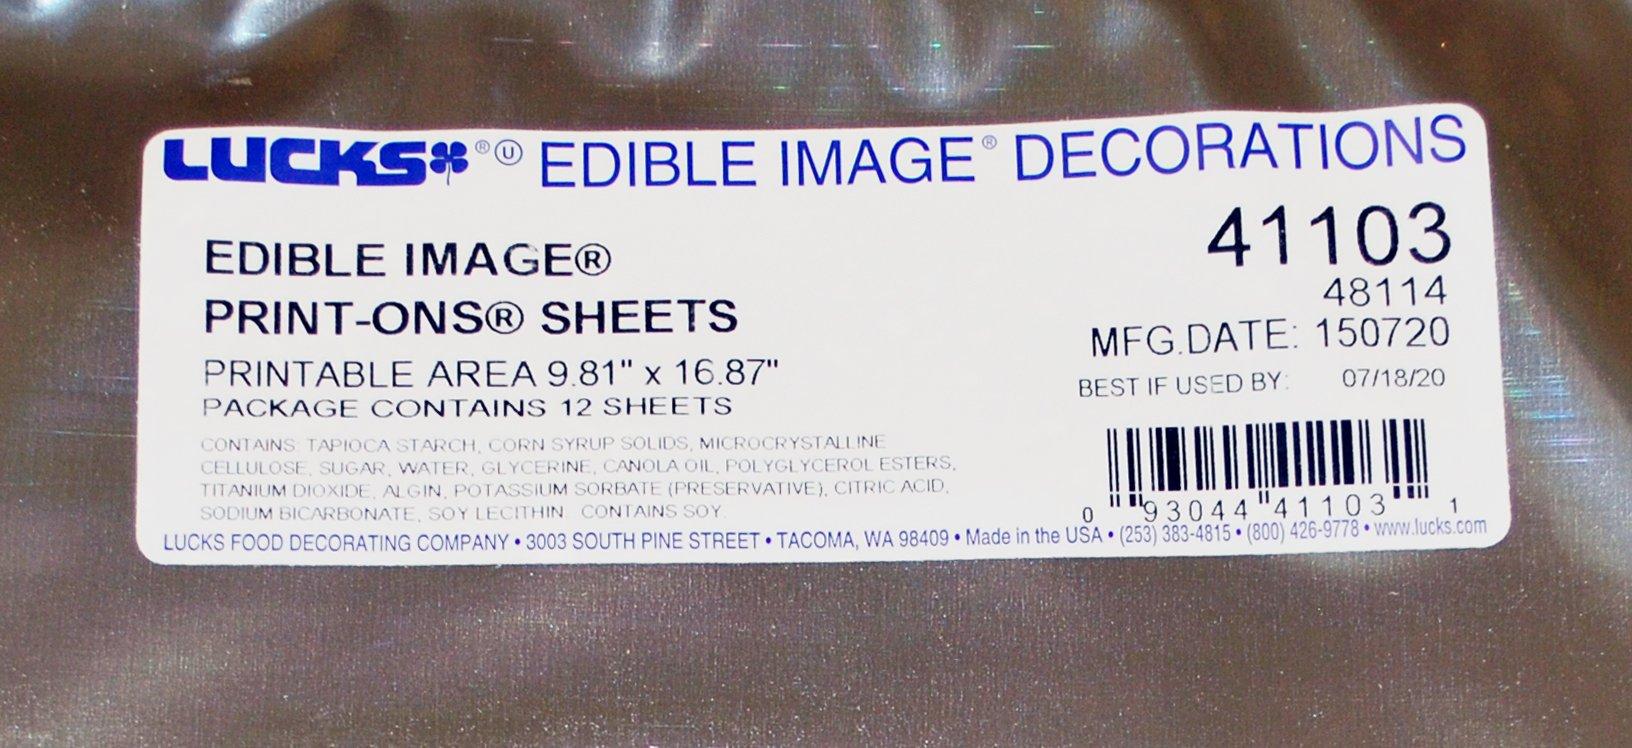 Lucks 48114 / 41103 11'' x 17'' Edible Image Print-Ons Sheets (12 sheets per pack x 2) by Lucks (Image #2)